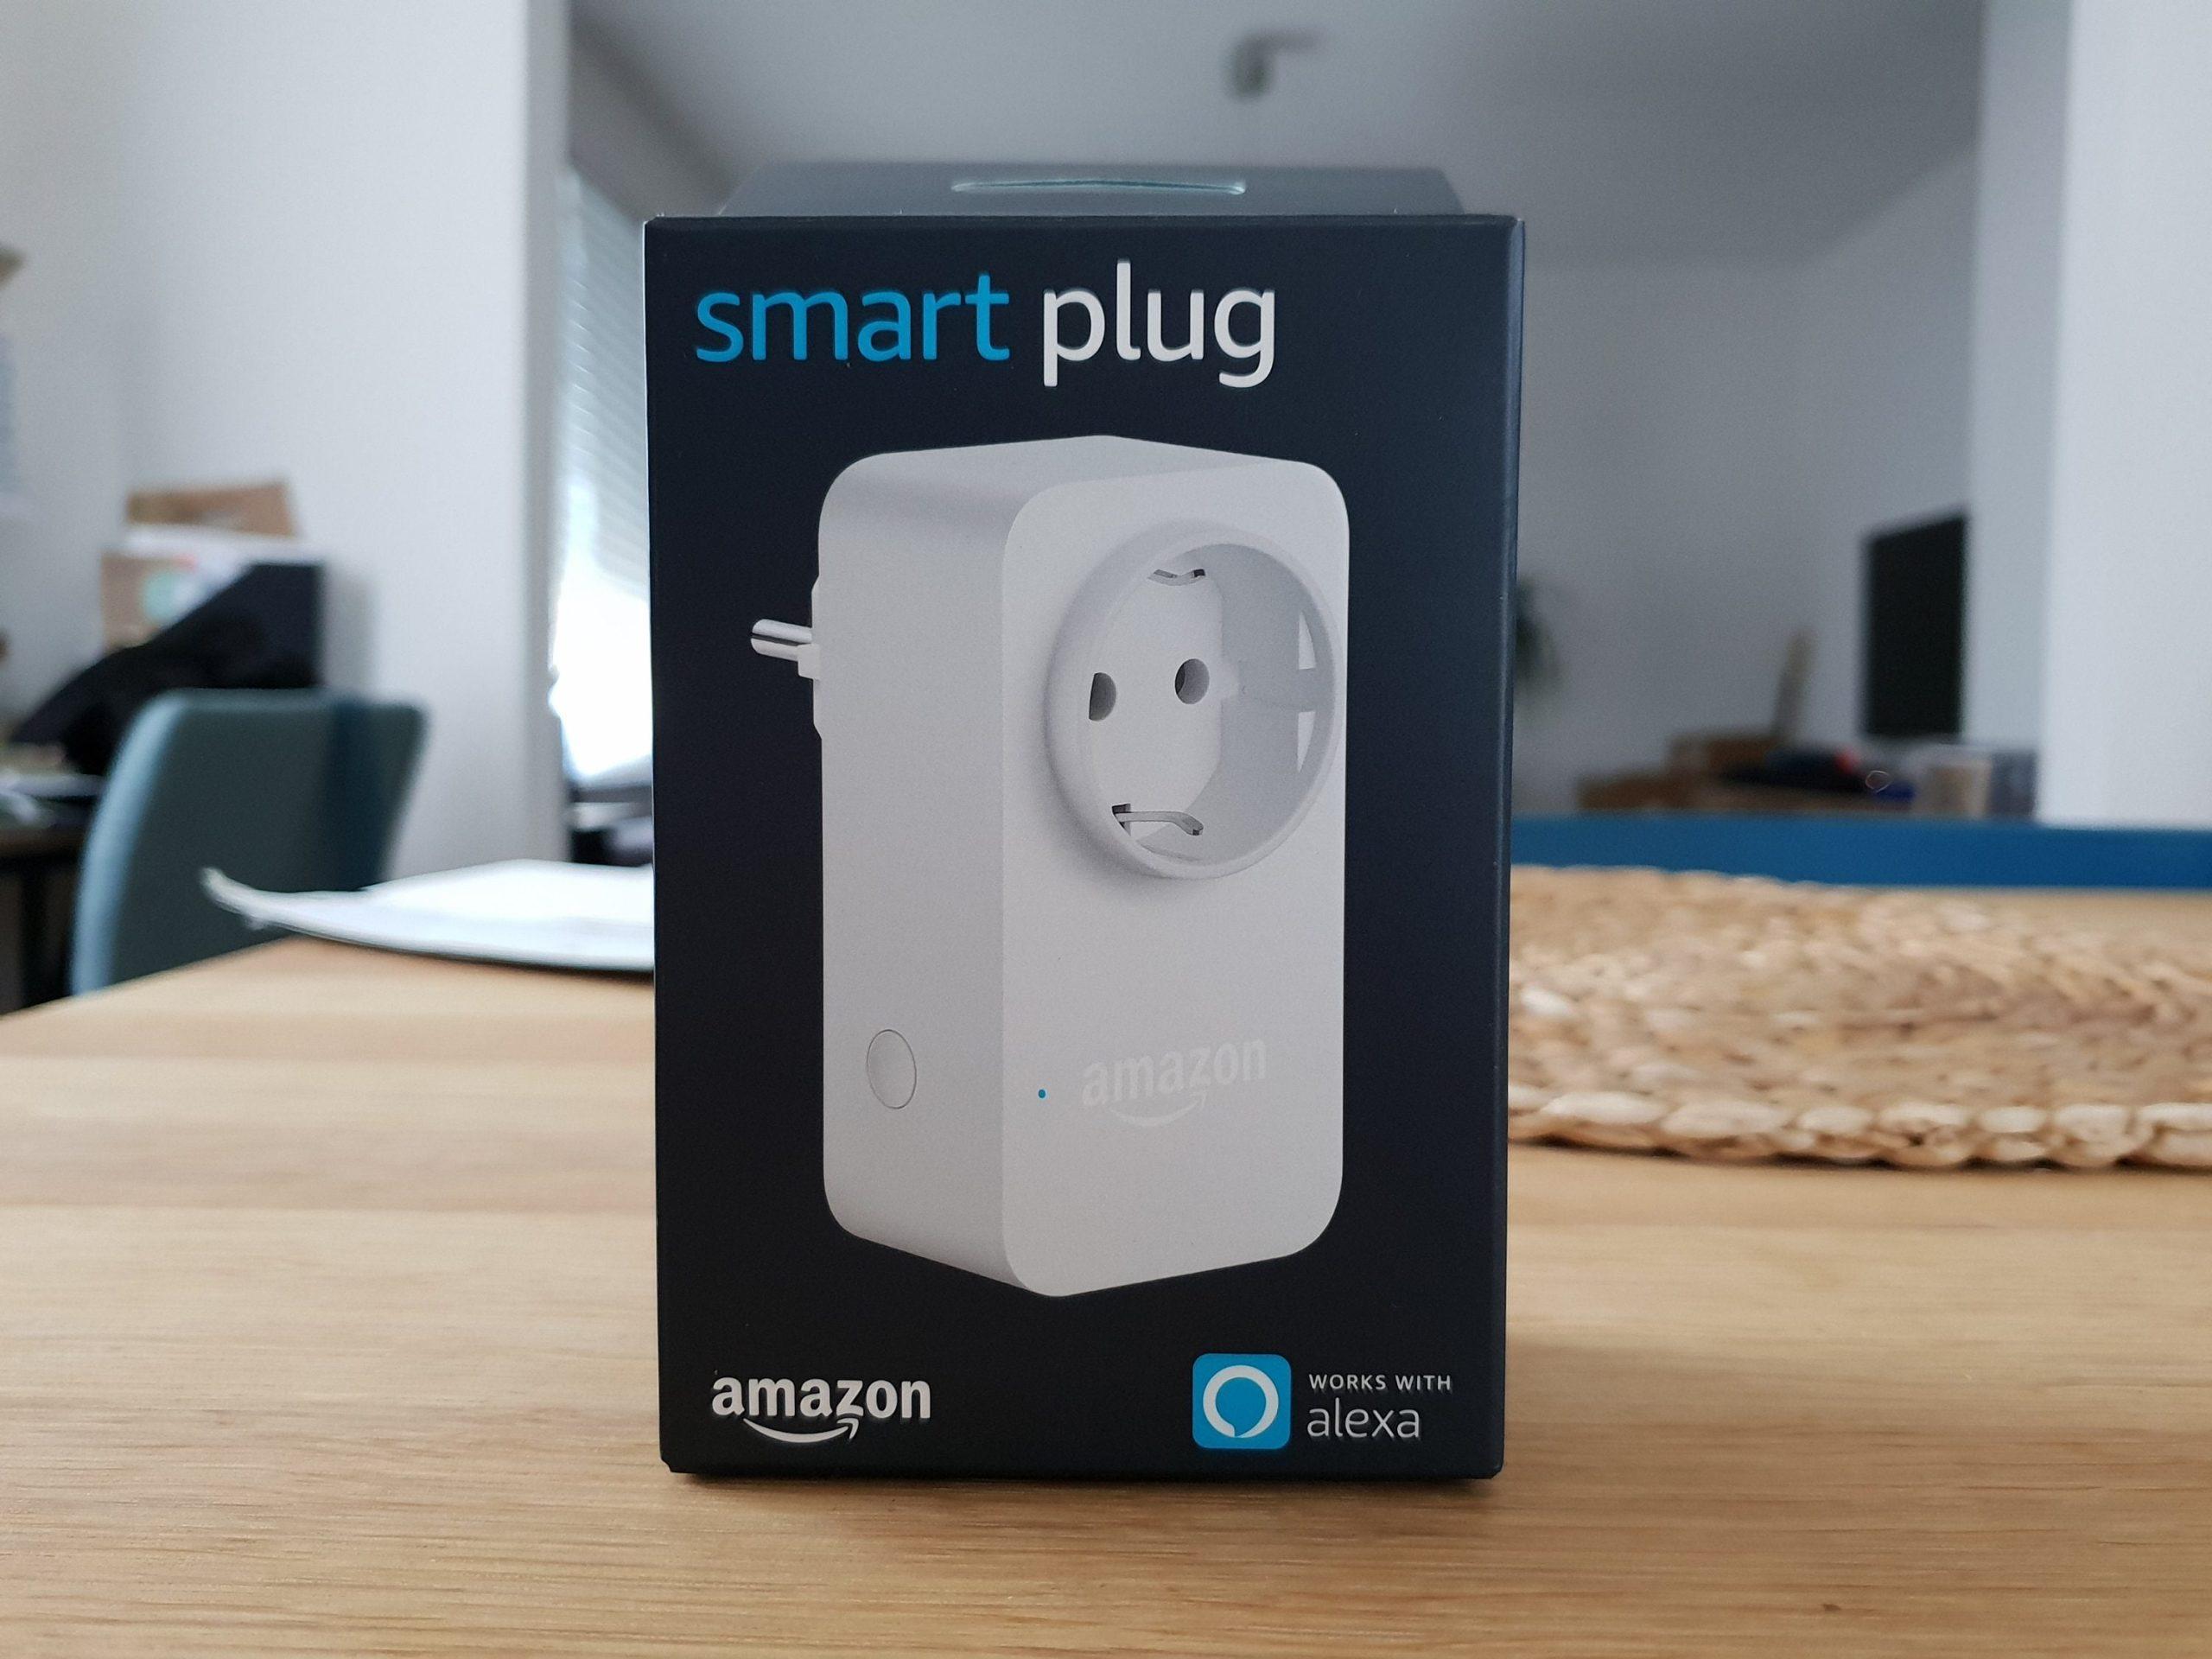 Amazon Smart Plug WLAN-Steckdose im Test techboys.de • smarte News, auf den Punkt!